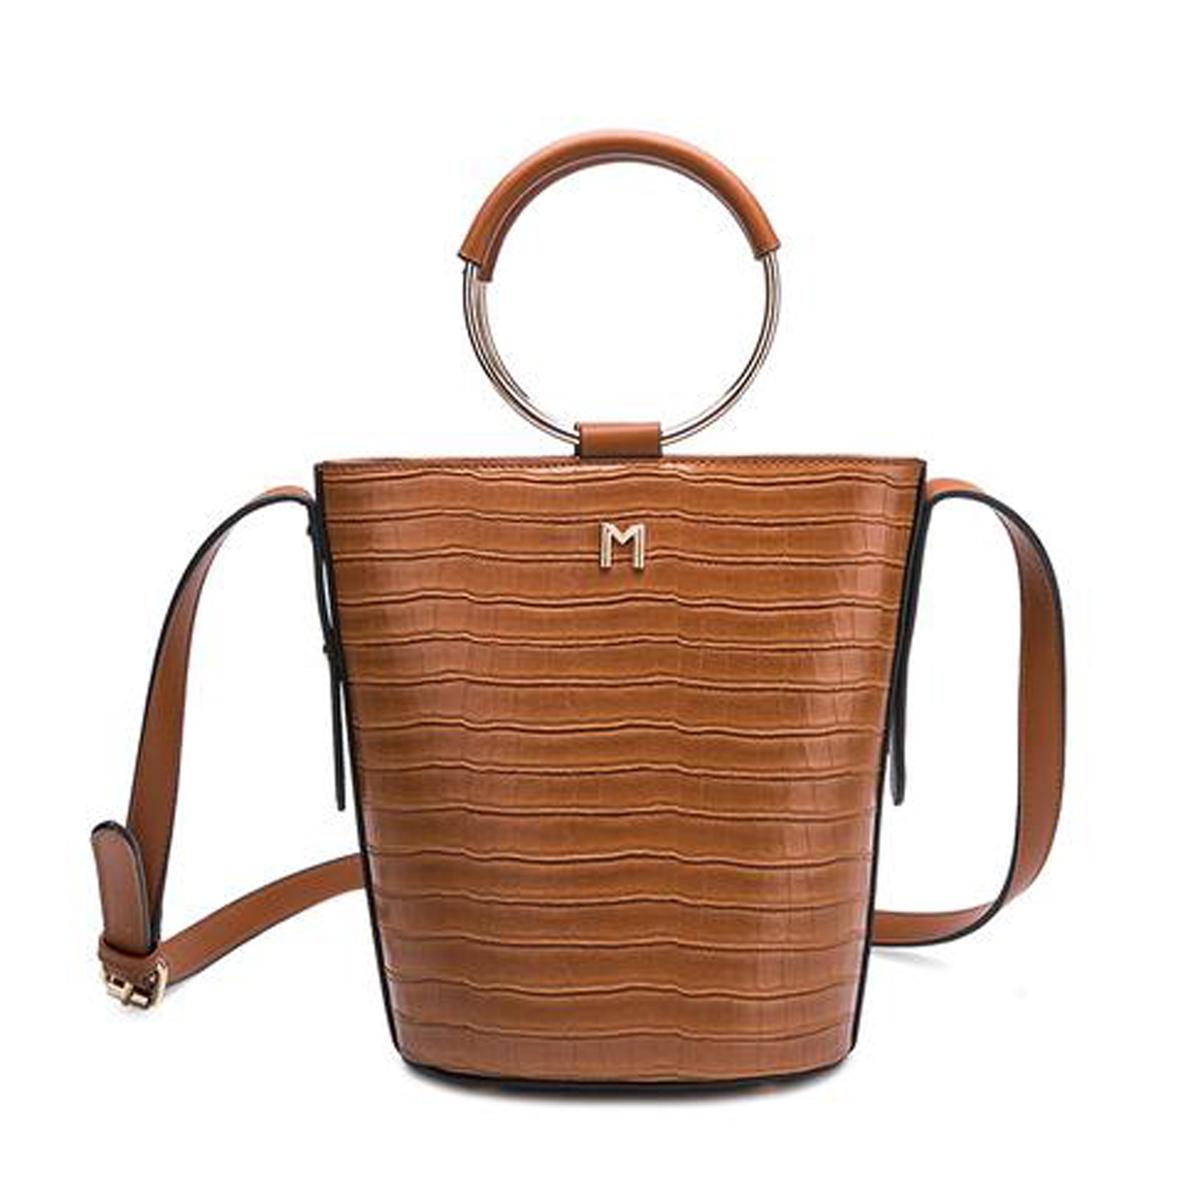 Melie Bianco Stella Croco Vegan Leather Ring Bucket Bag Tan